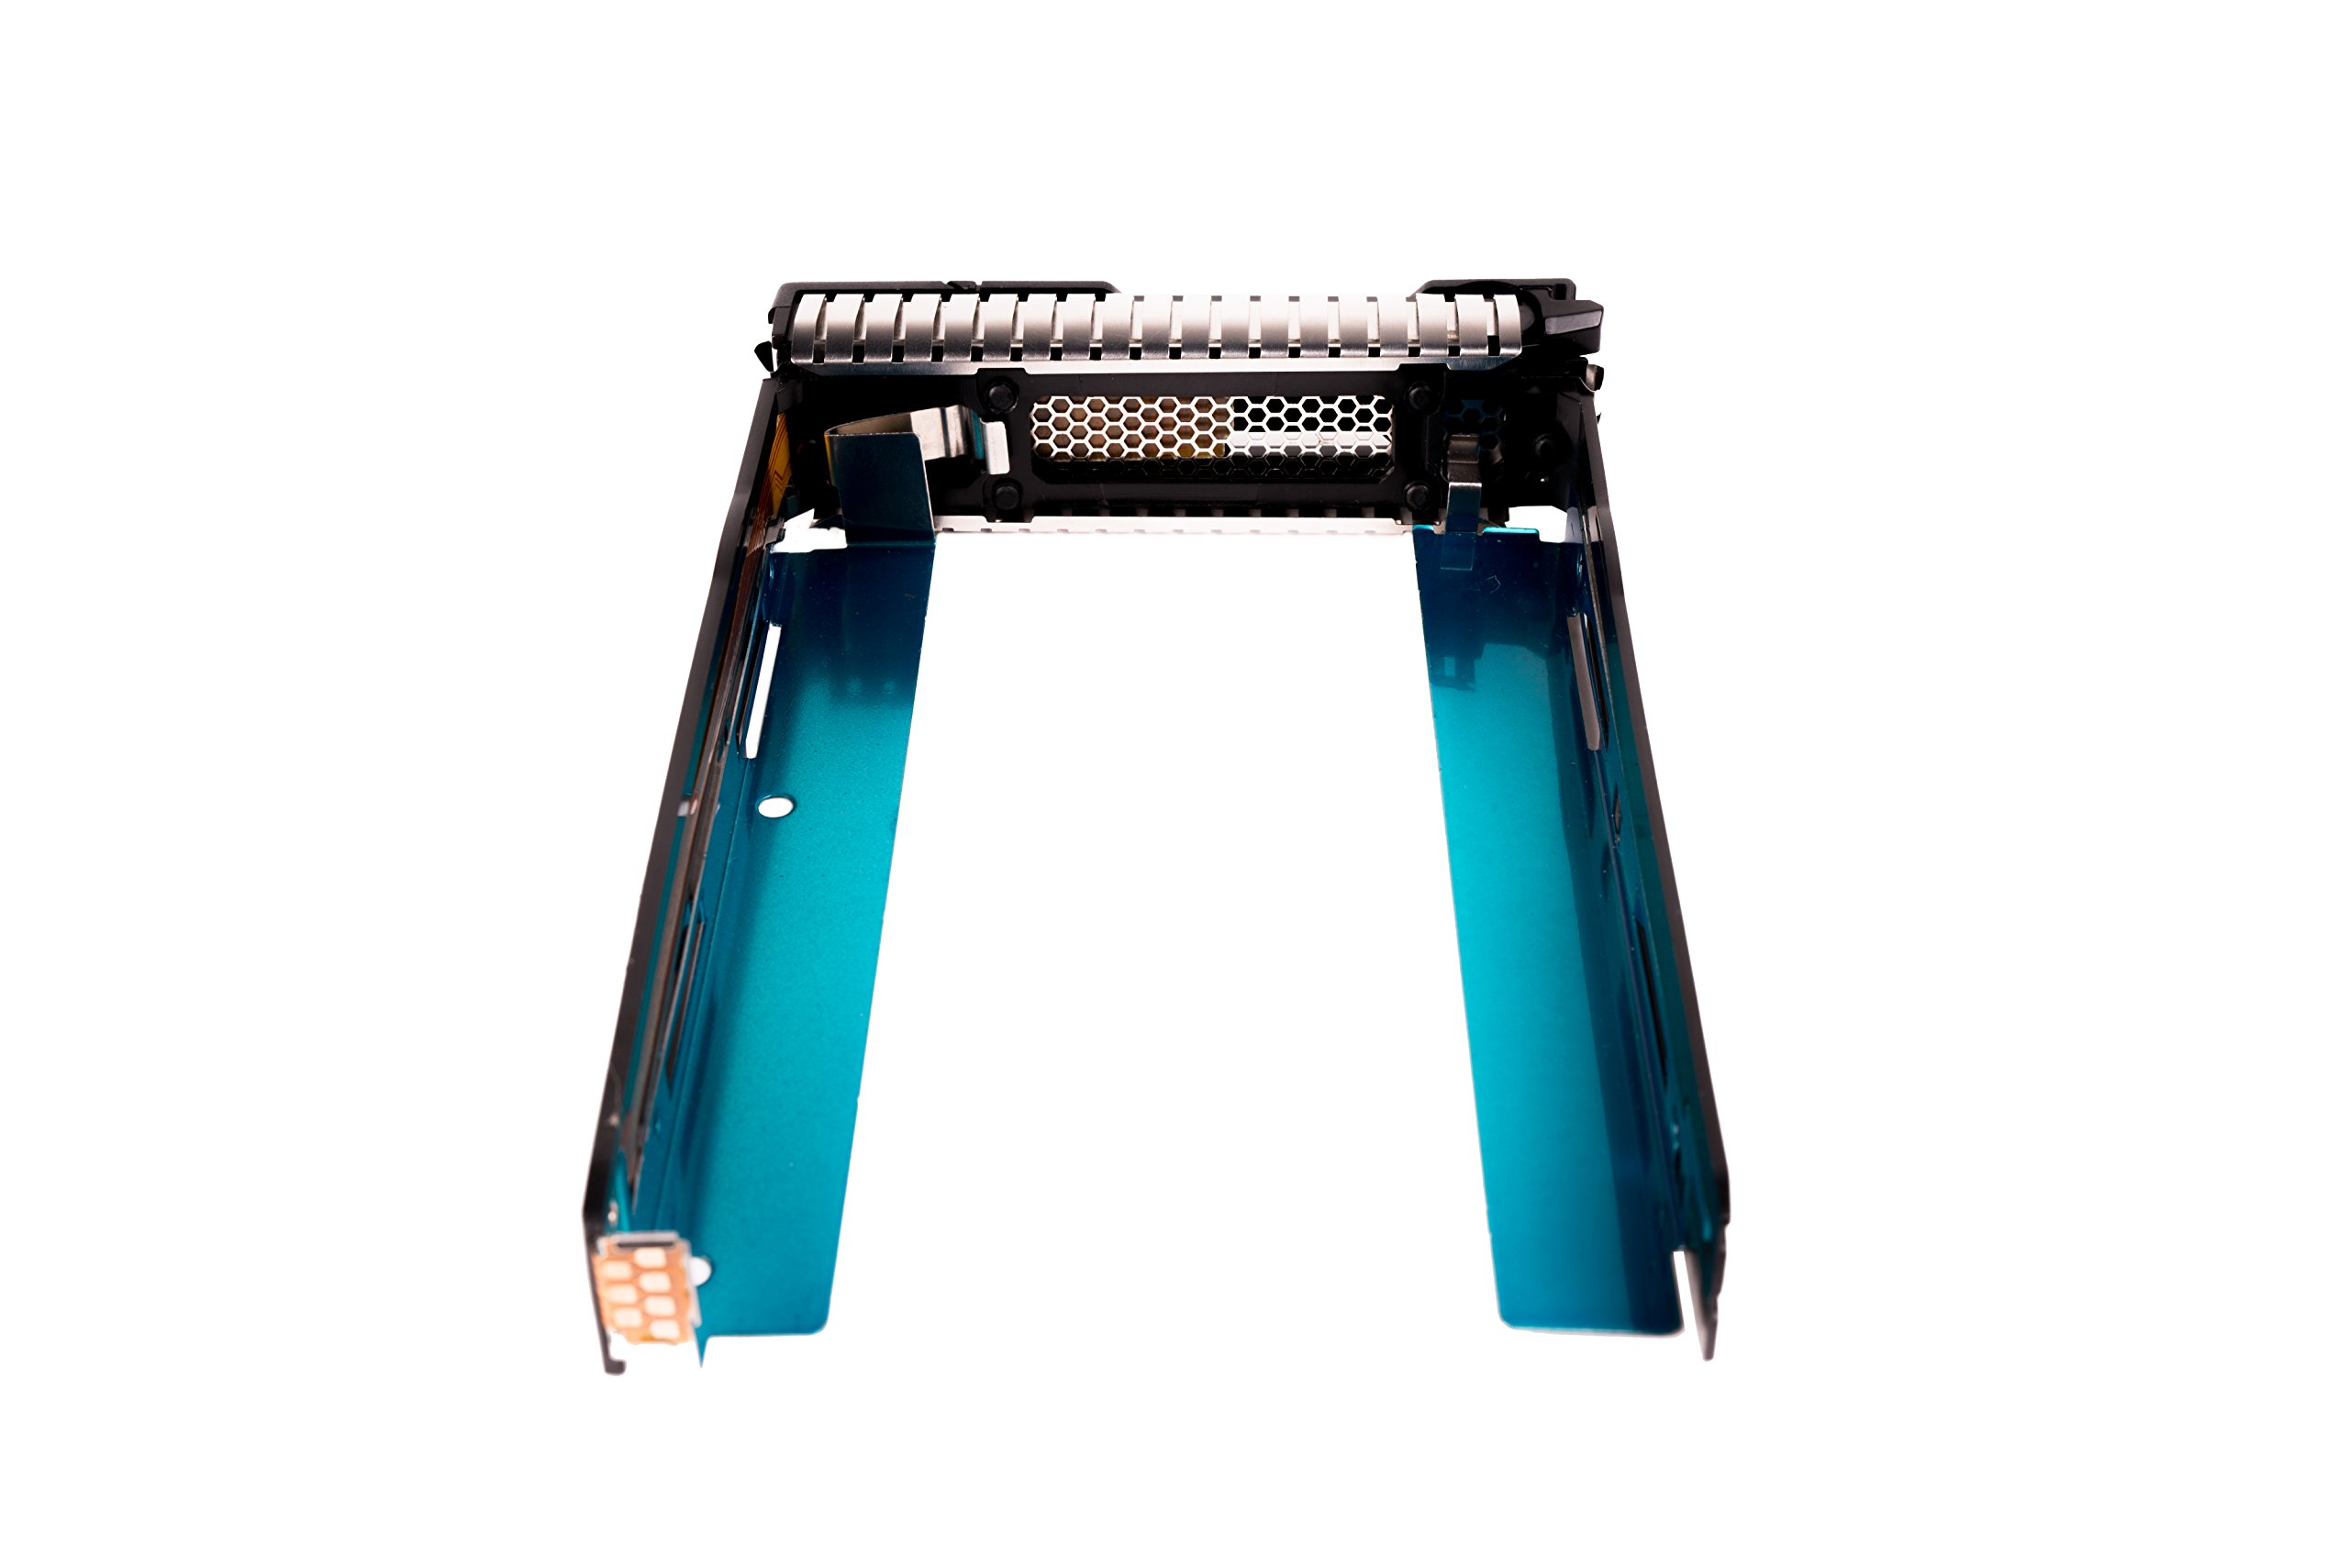 WALI 3.5'' 651314-001 Gen8 G9 3.5 LFF Drive Tray DL388 DL560 WS460C BL420C BL465C BL660C G8 LFF SAS SATA HDD Tray Caddy Exclusively